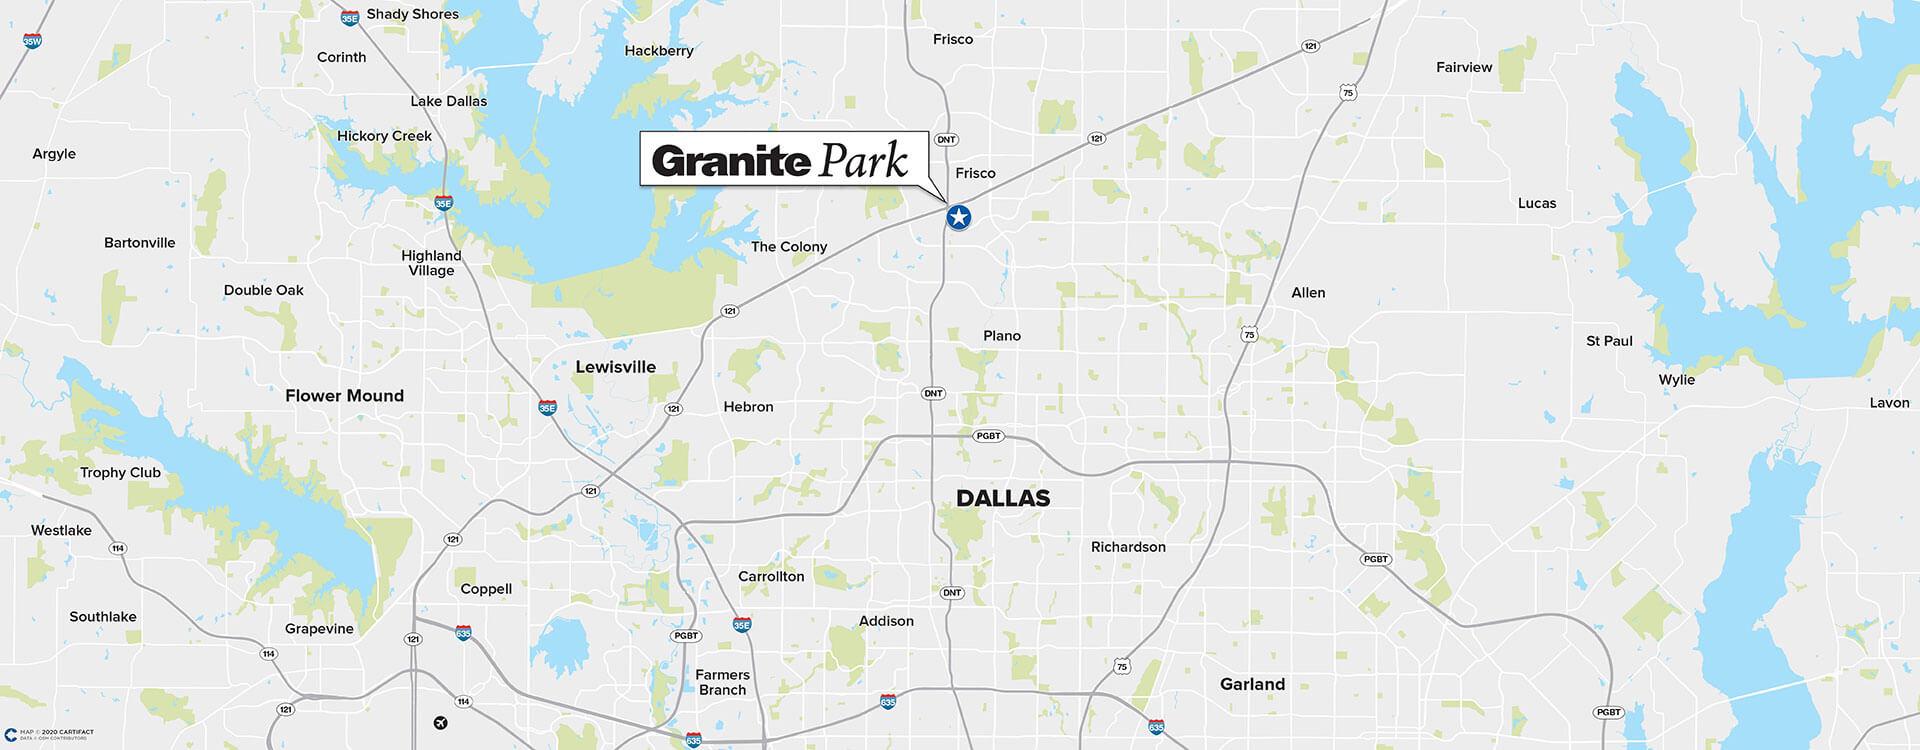 Granite Park One location map